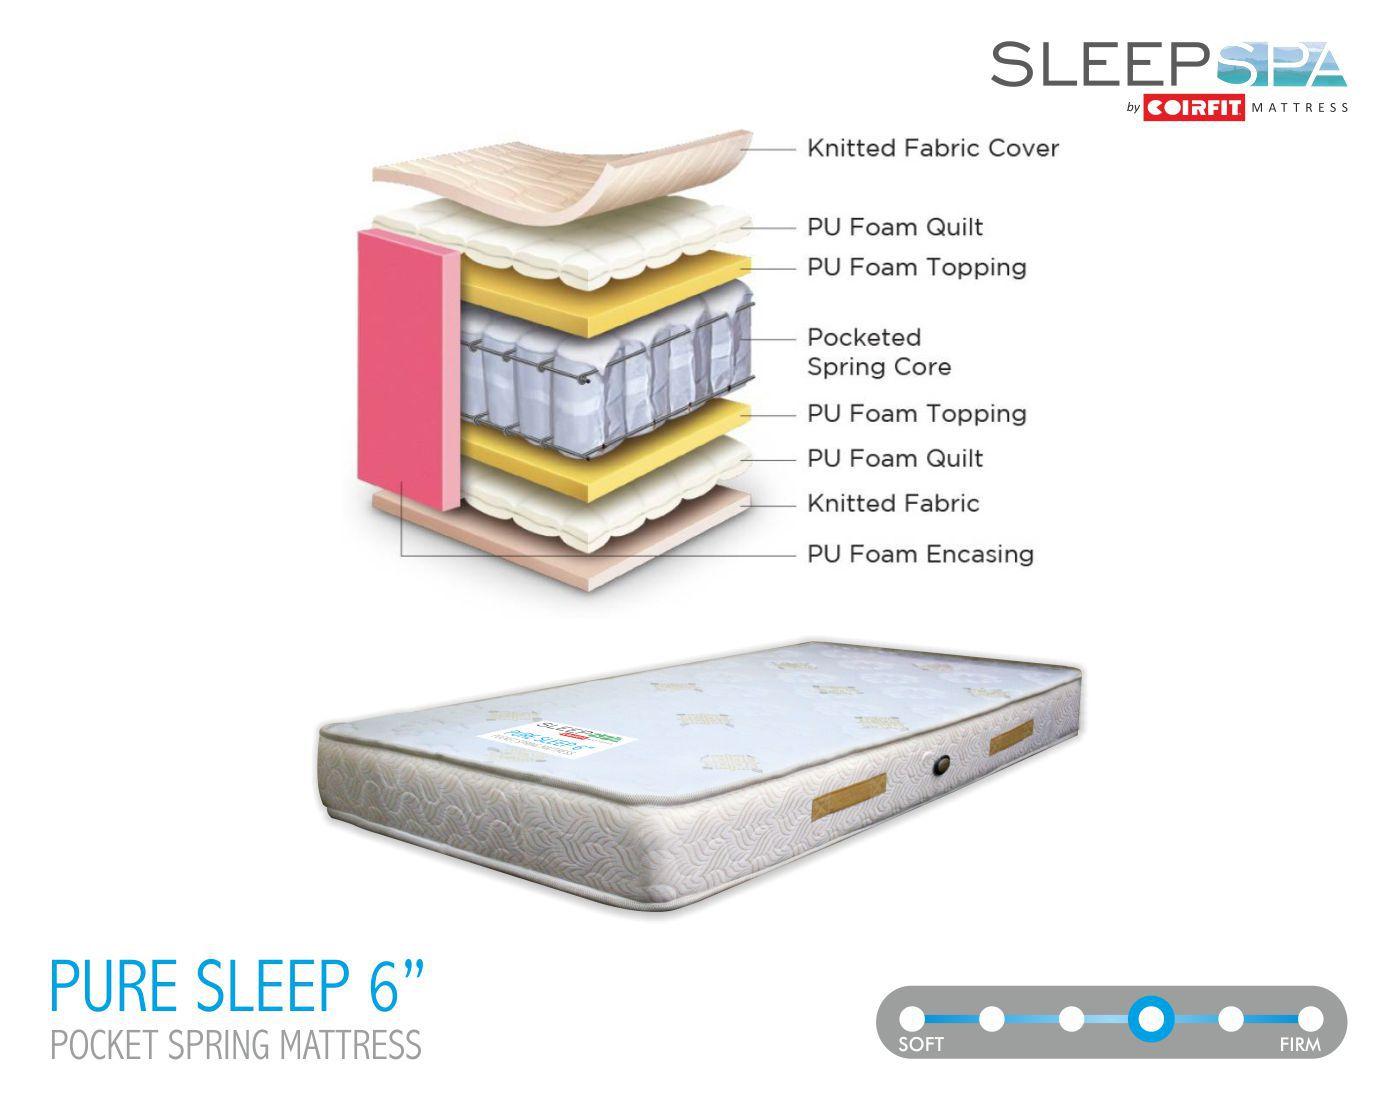 sleep spa pure sleep pocket 6 inches orthopedic spring mattress